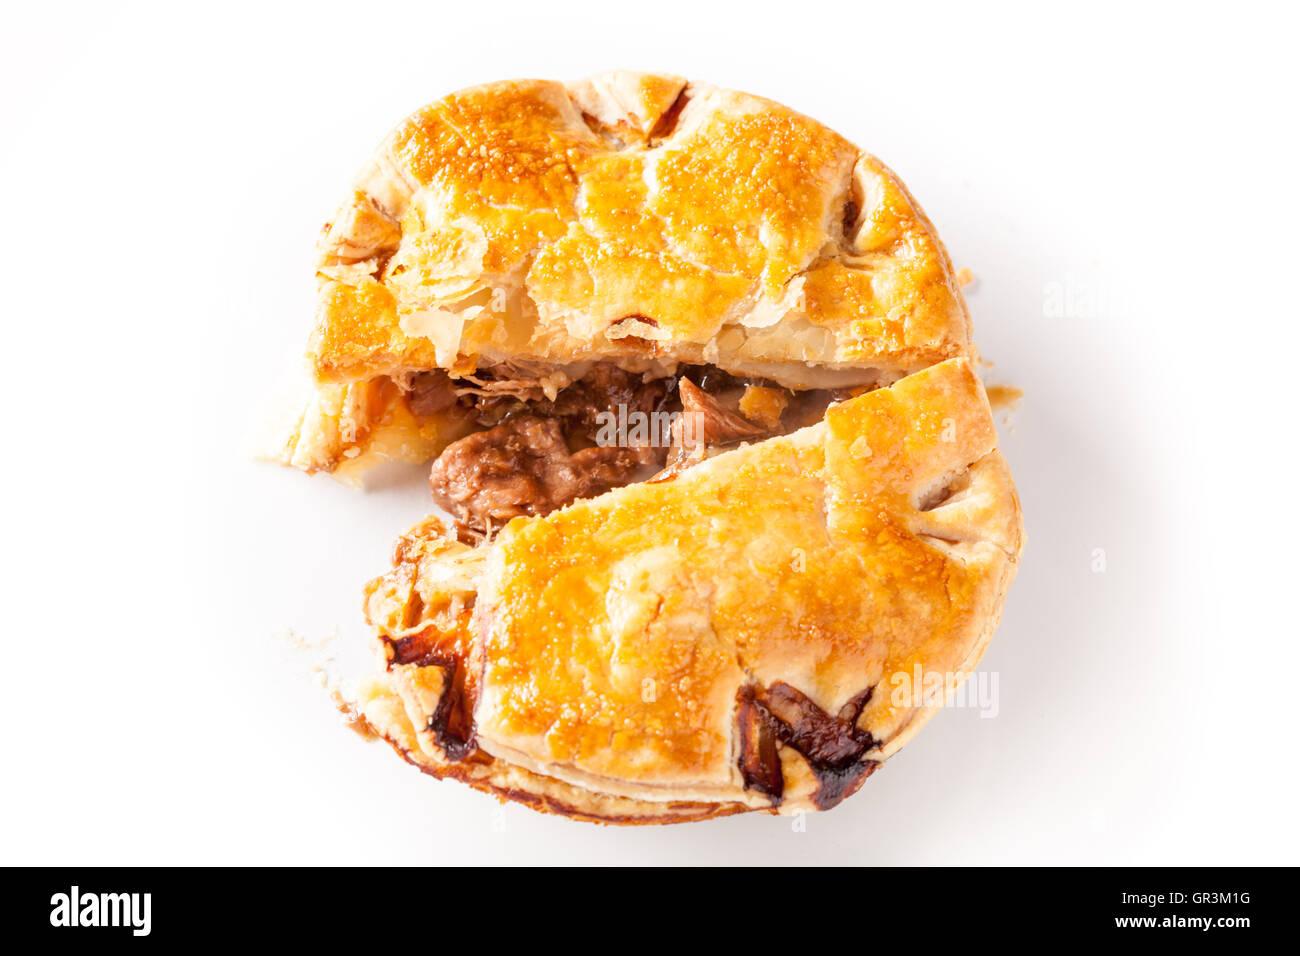 Beef Steak and Kidney Pie - Stock Image